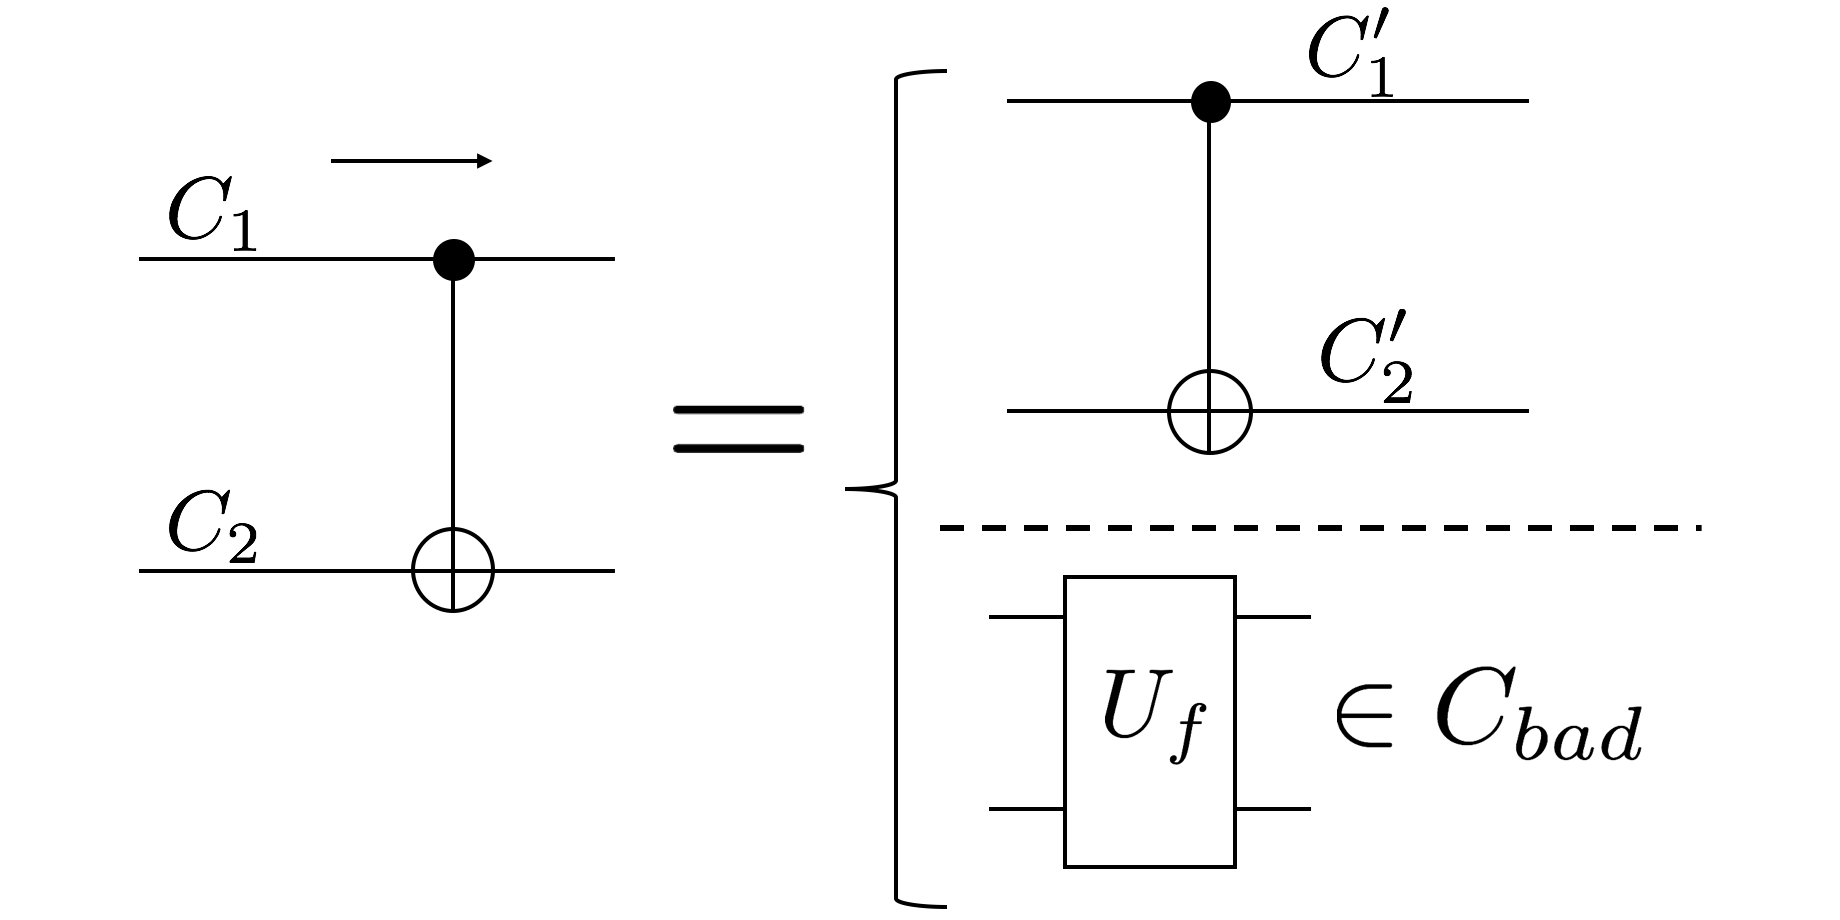 Fault Tolerant Quantum Computing In The Pauli Or Clifford Frame With Slow Error Diagnostics